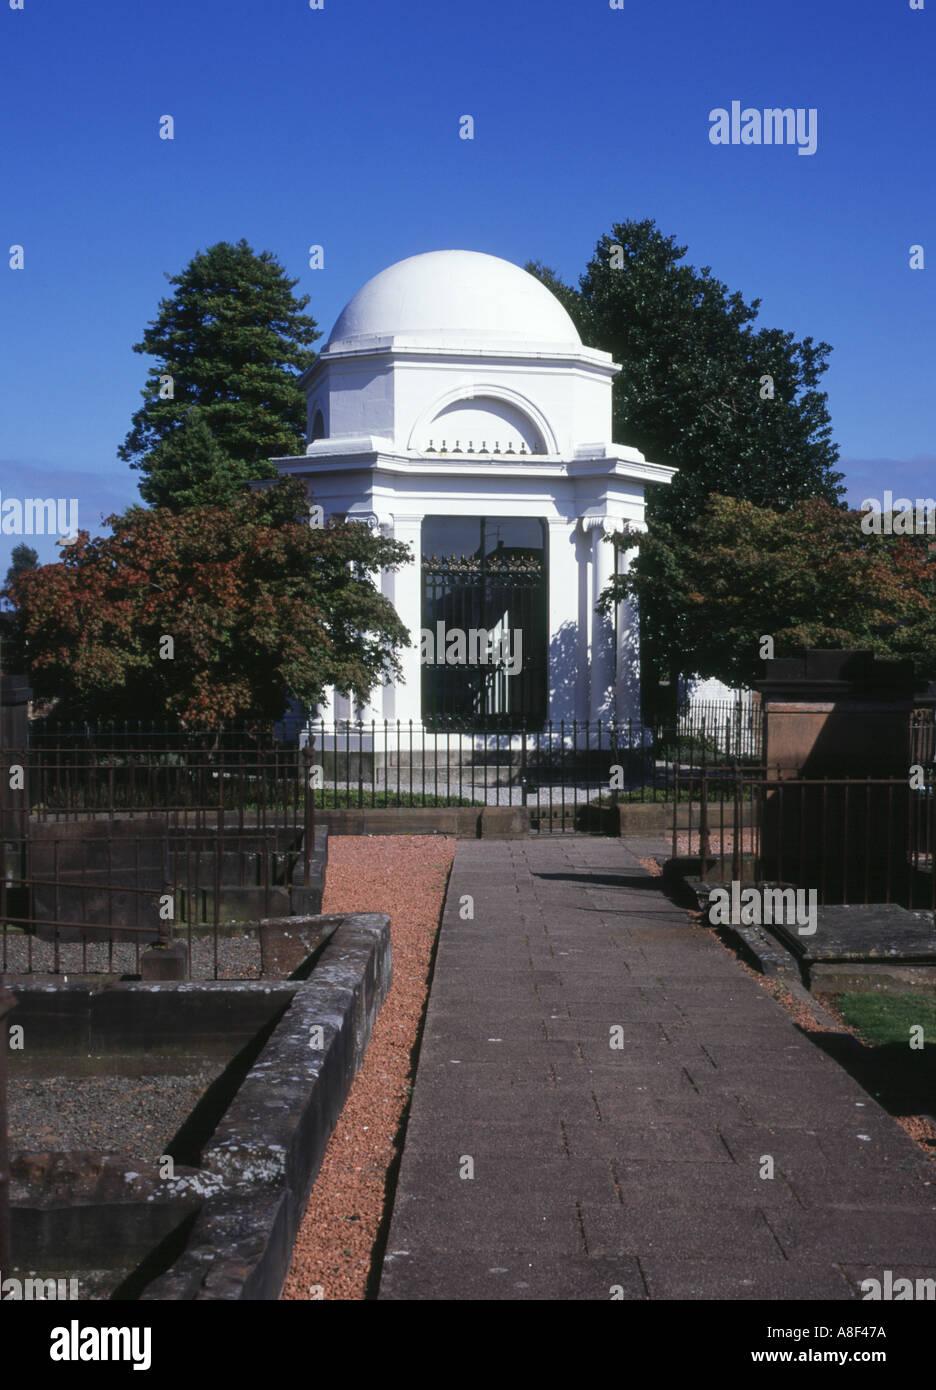 dh St Michaels und Süd DUMFRIES GALLOWAY Robert Burns Dichter neoklassizistischen Mausoleum Friedhof Friedhof Stockfoto